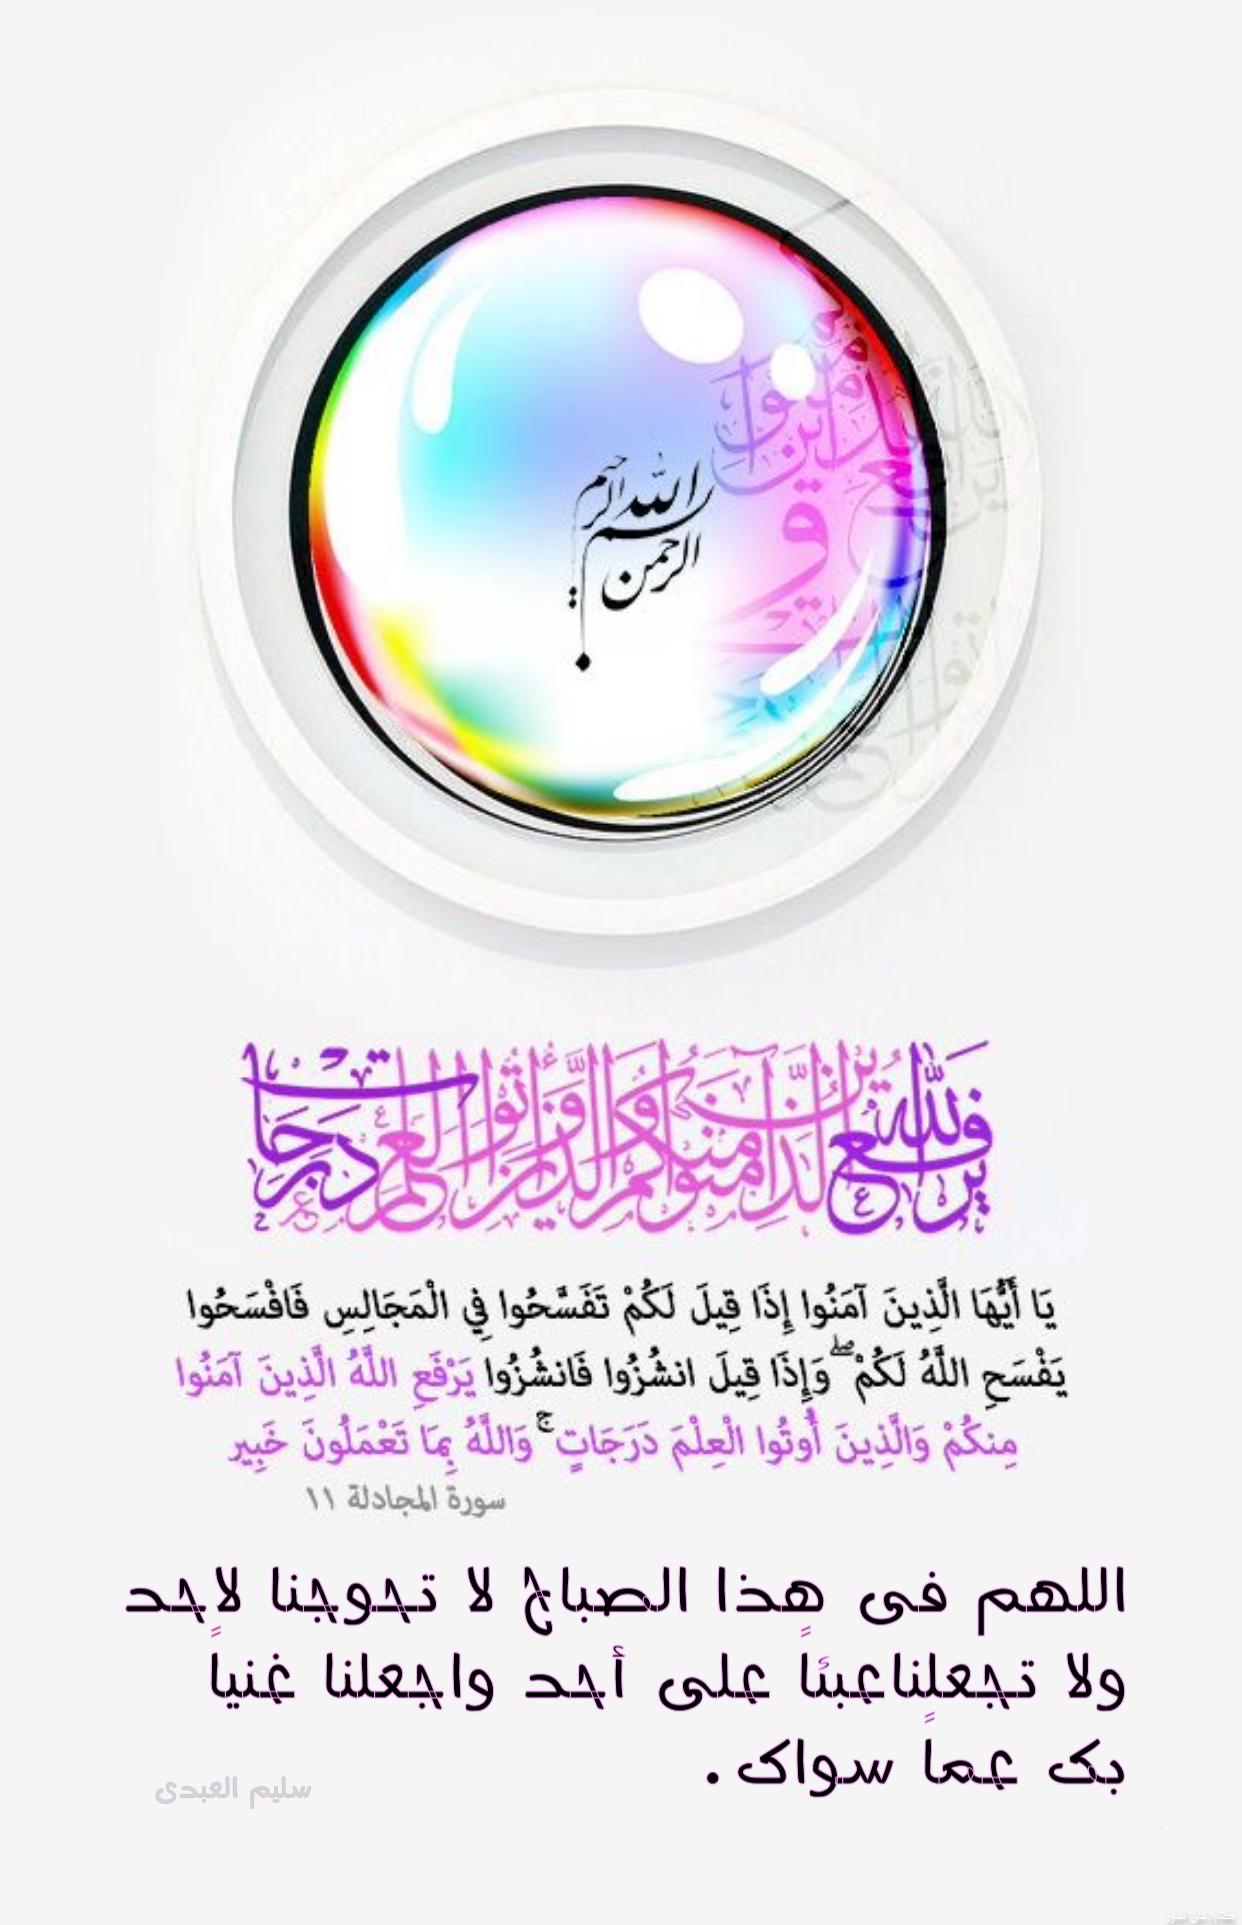 Pin By Sam On صباح الخير In 2020 Islamic Art Quran Prayers